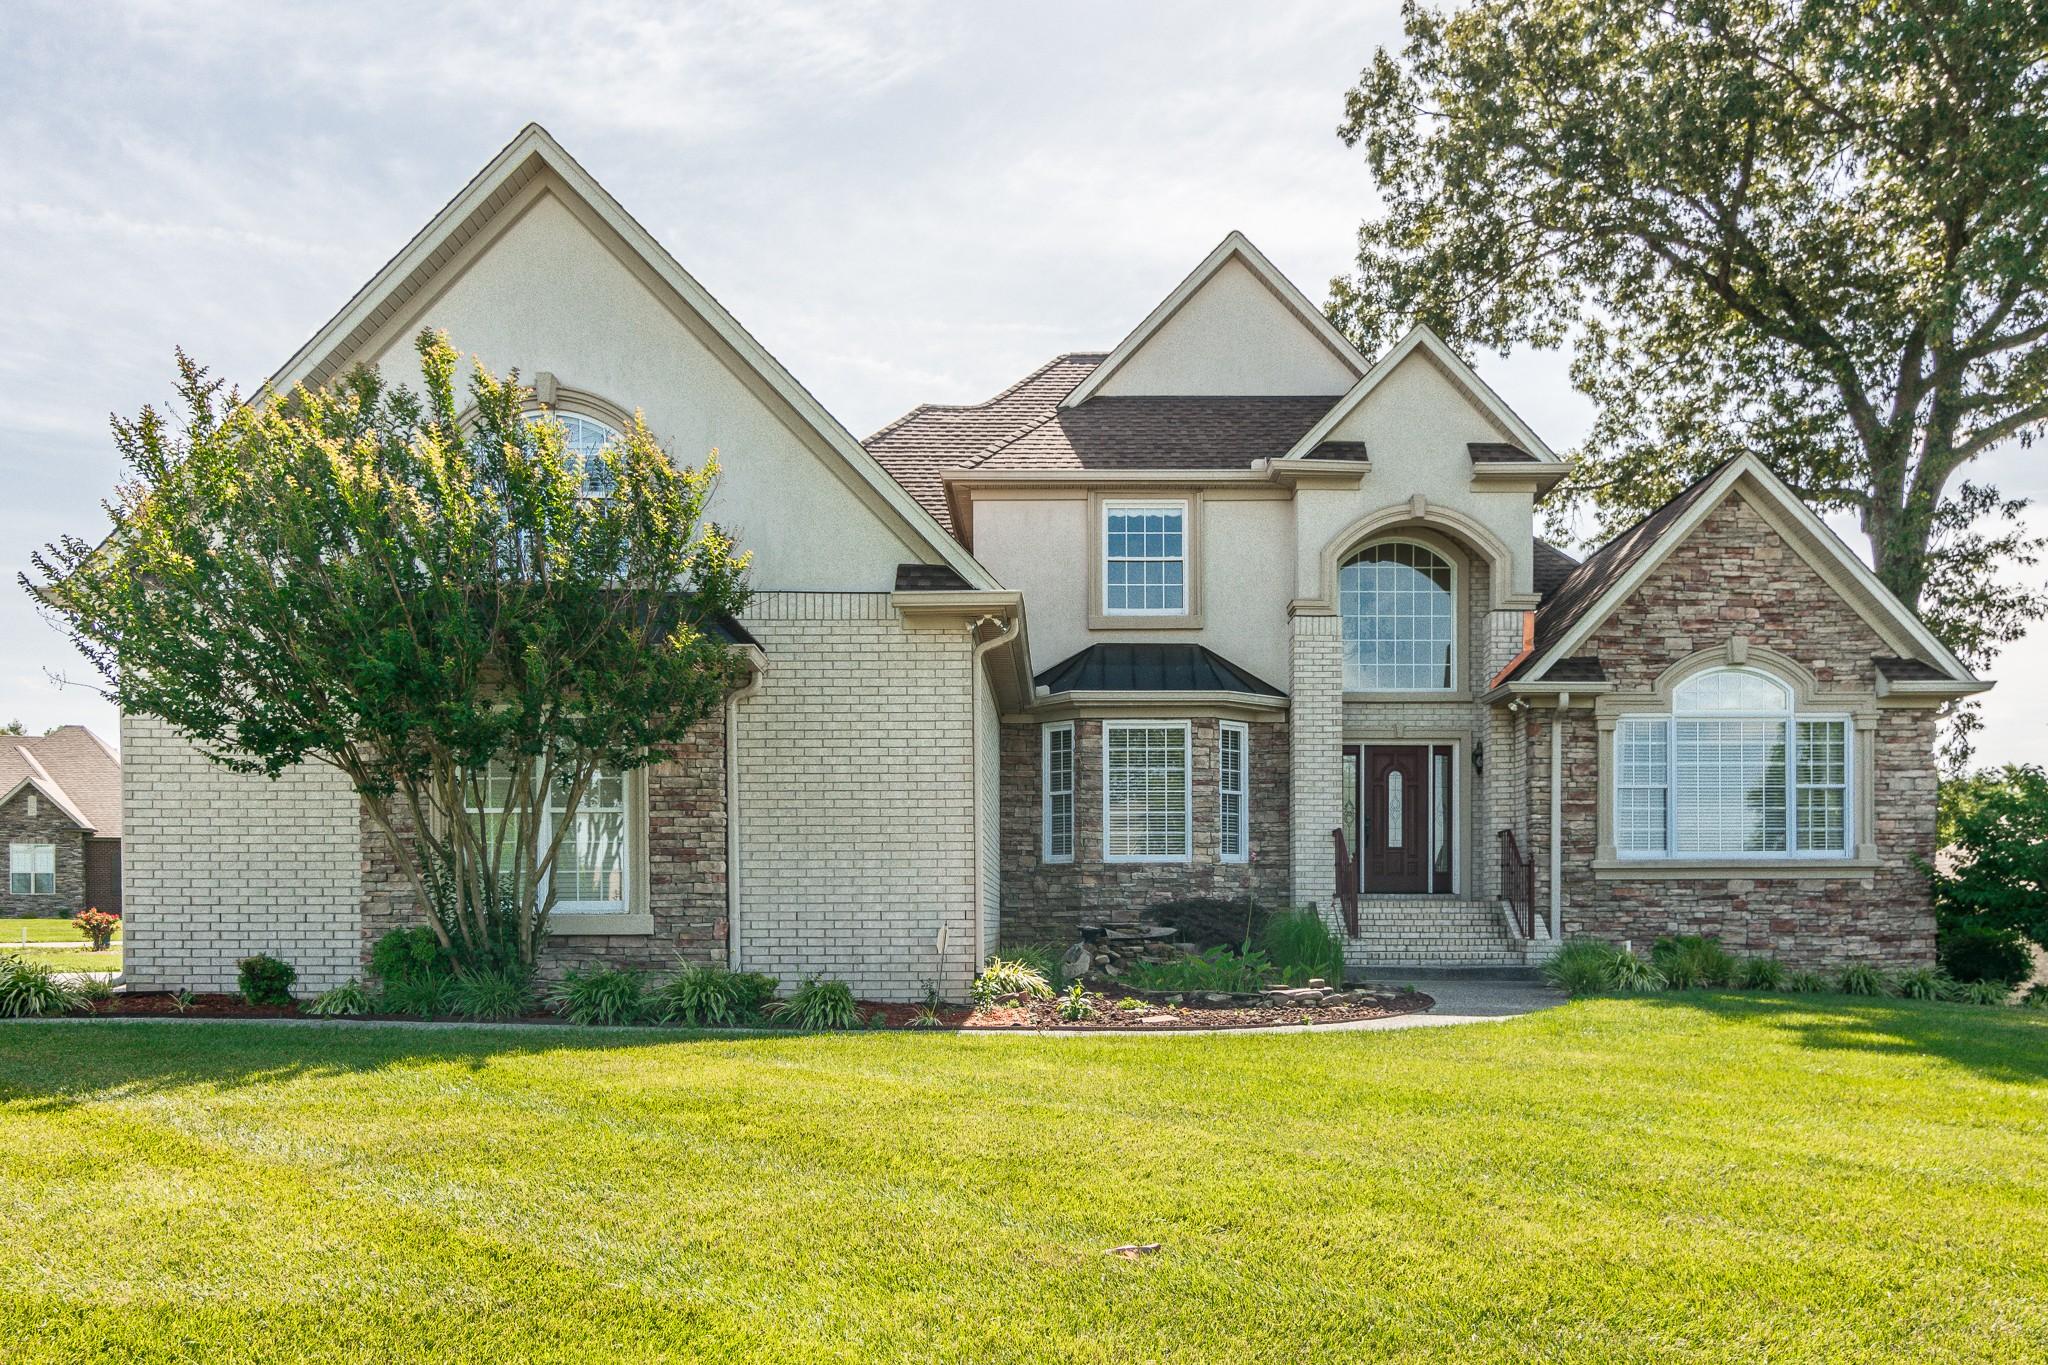 202 Denise Cir Property Photo - White House, TN real estate listing